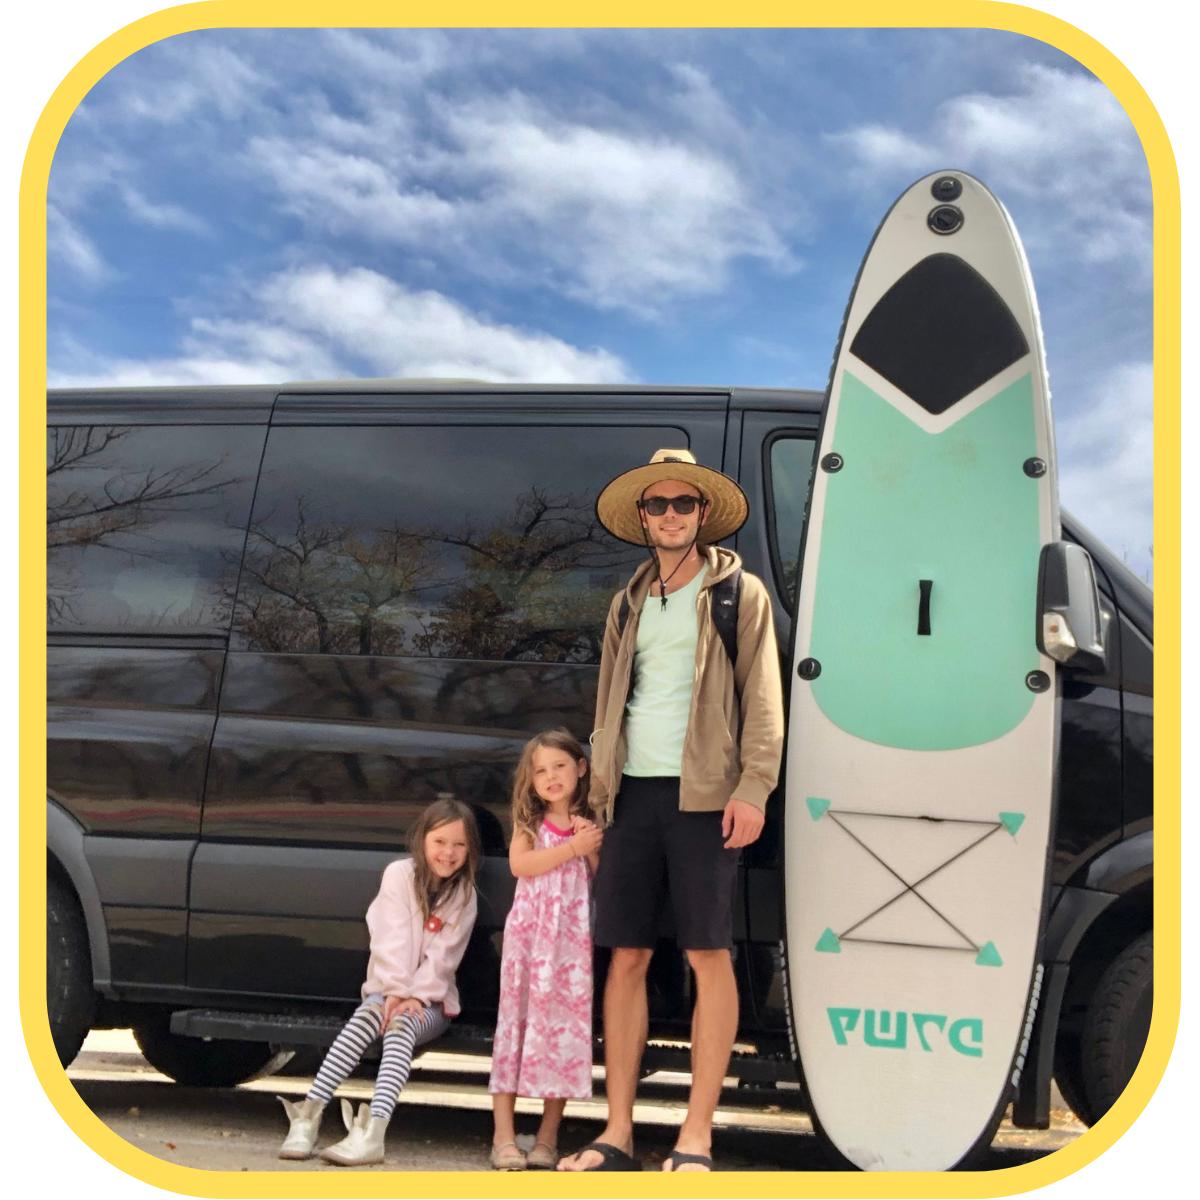 denver-tour-club-2021-outdoor-adventures-school-year-kids-camp-10-.png